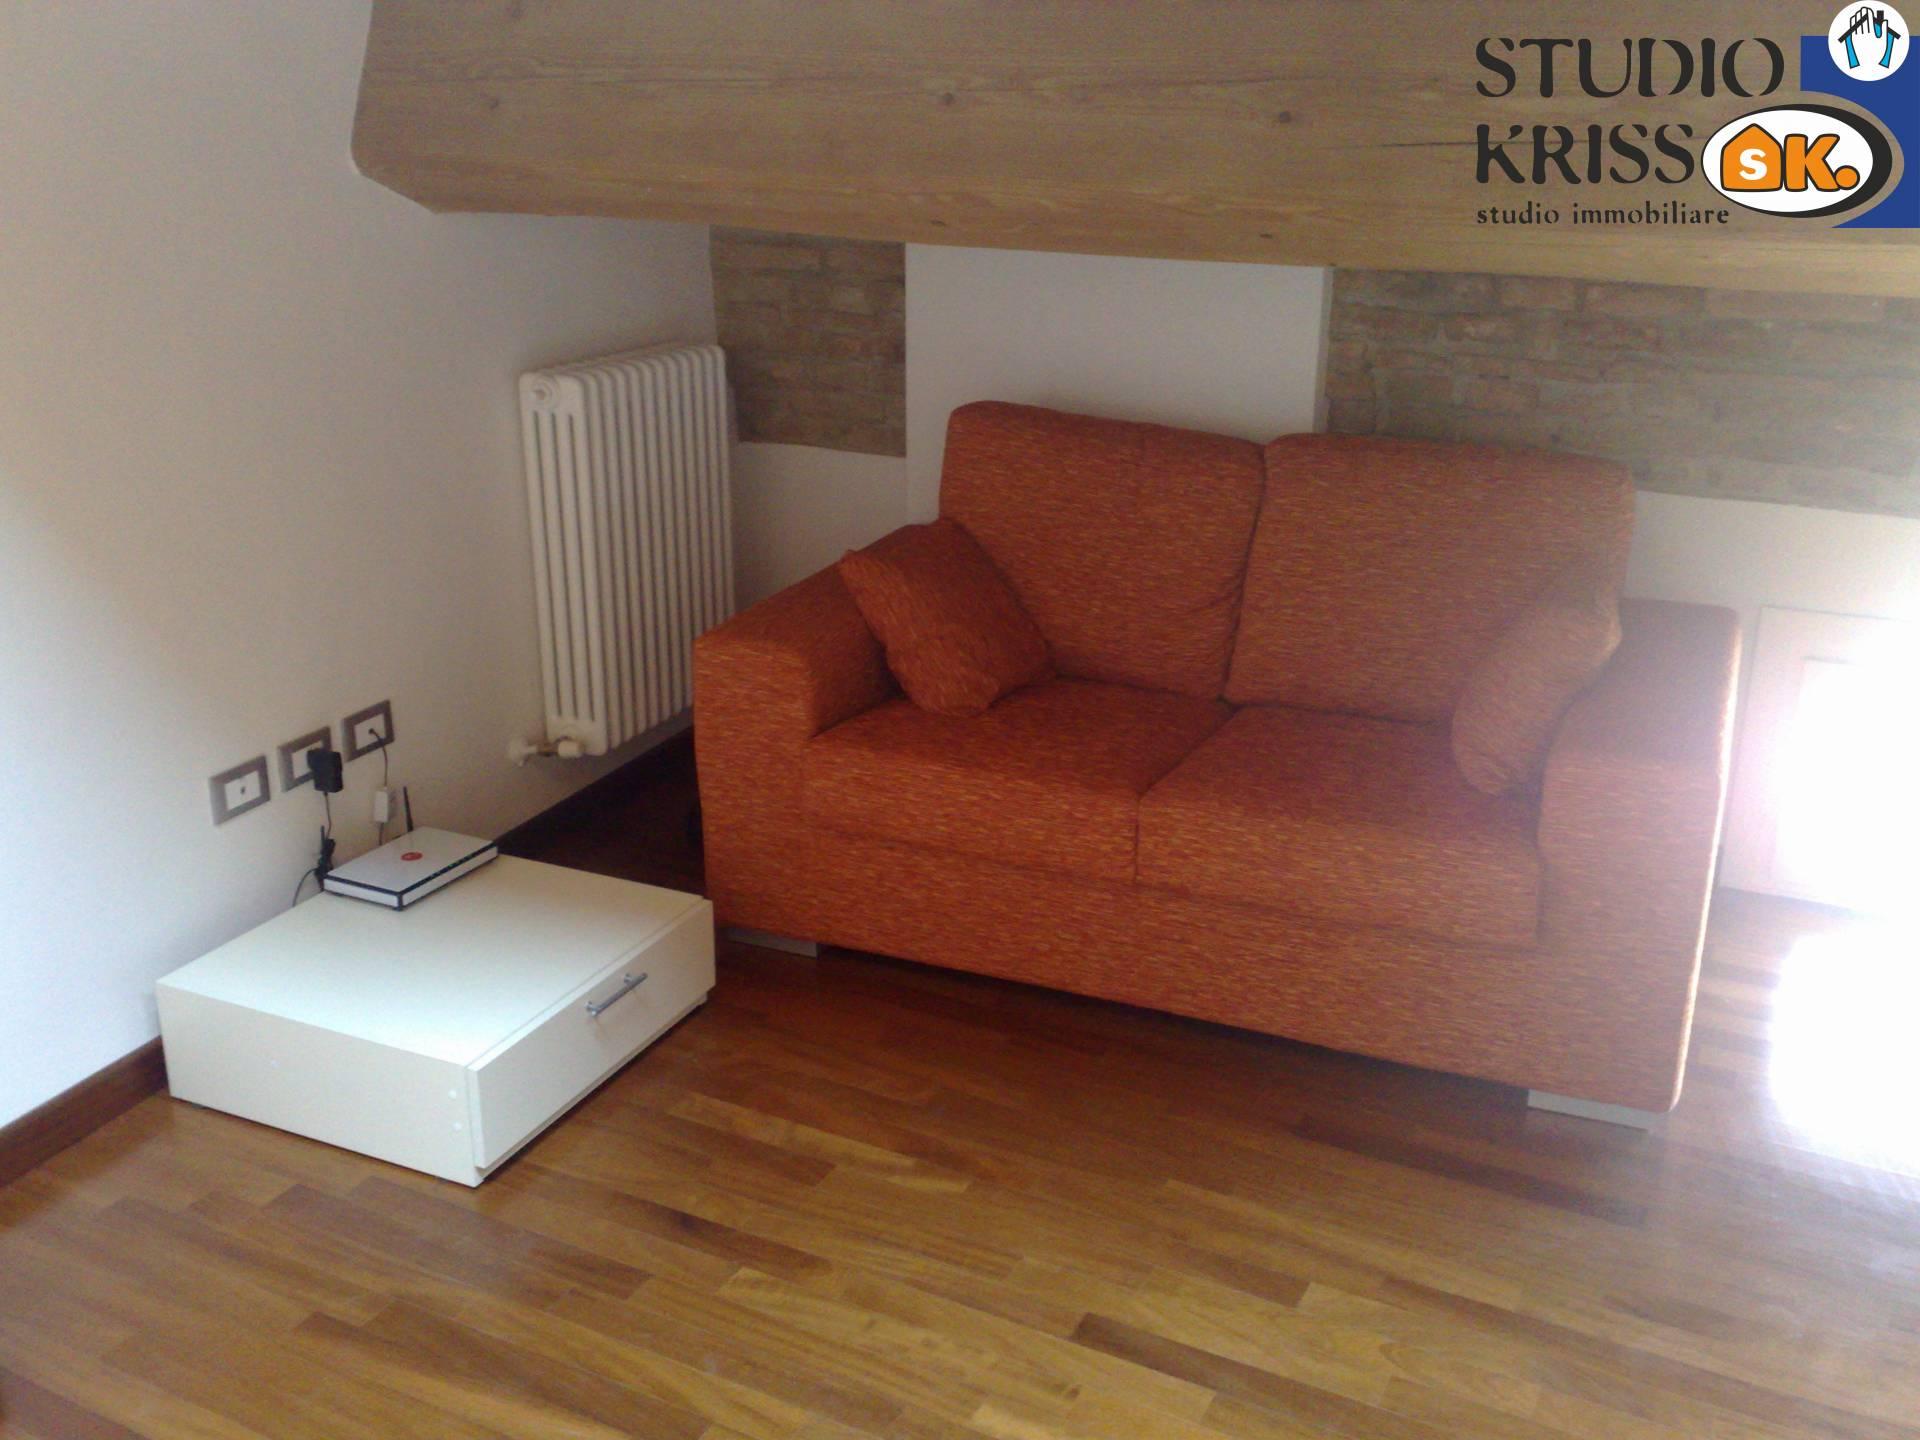 Appartamento in Vendita a Ferrara: 2 locali, 60 mq - Foto 2